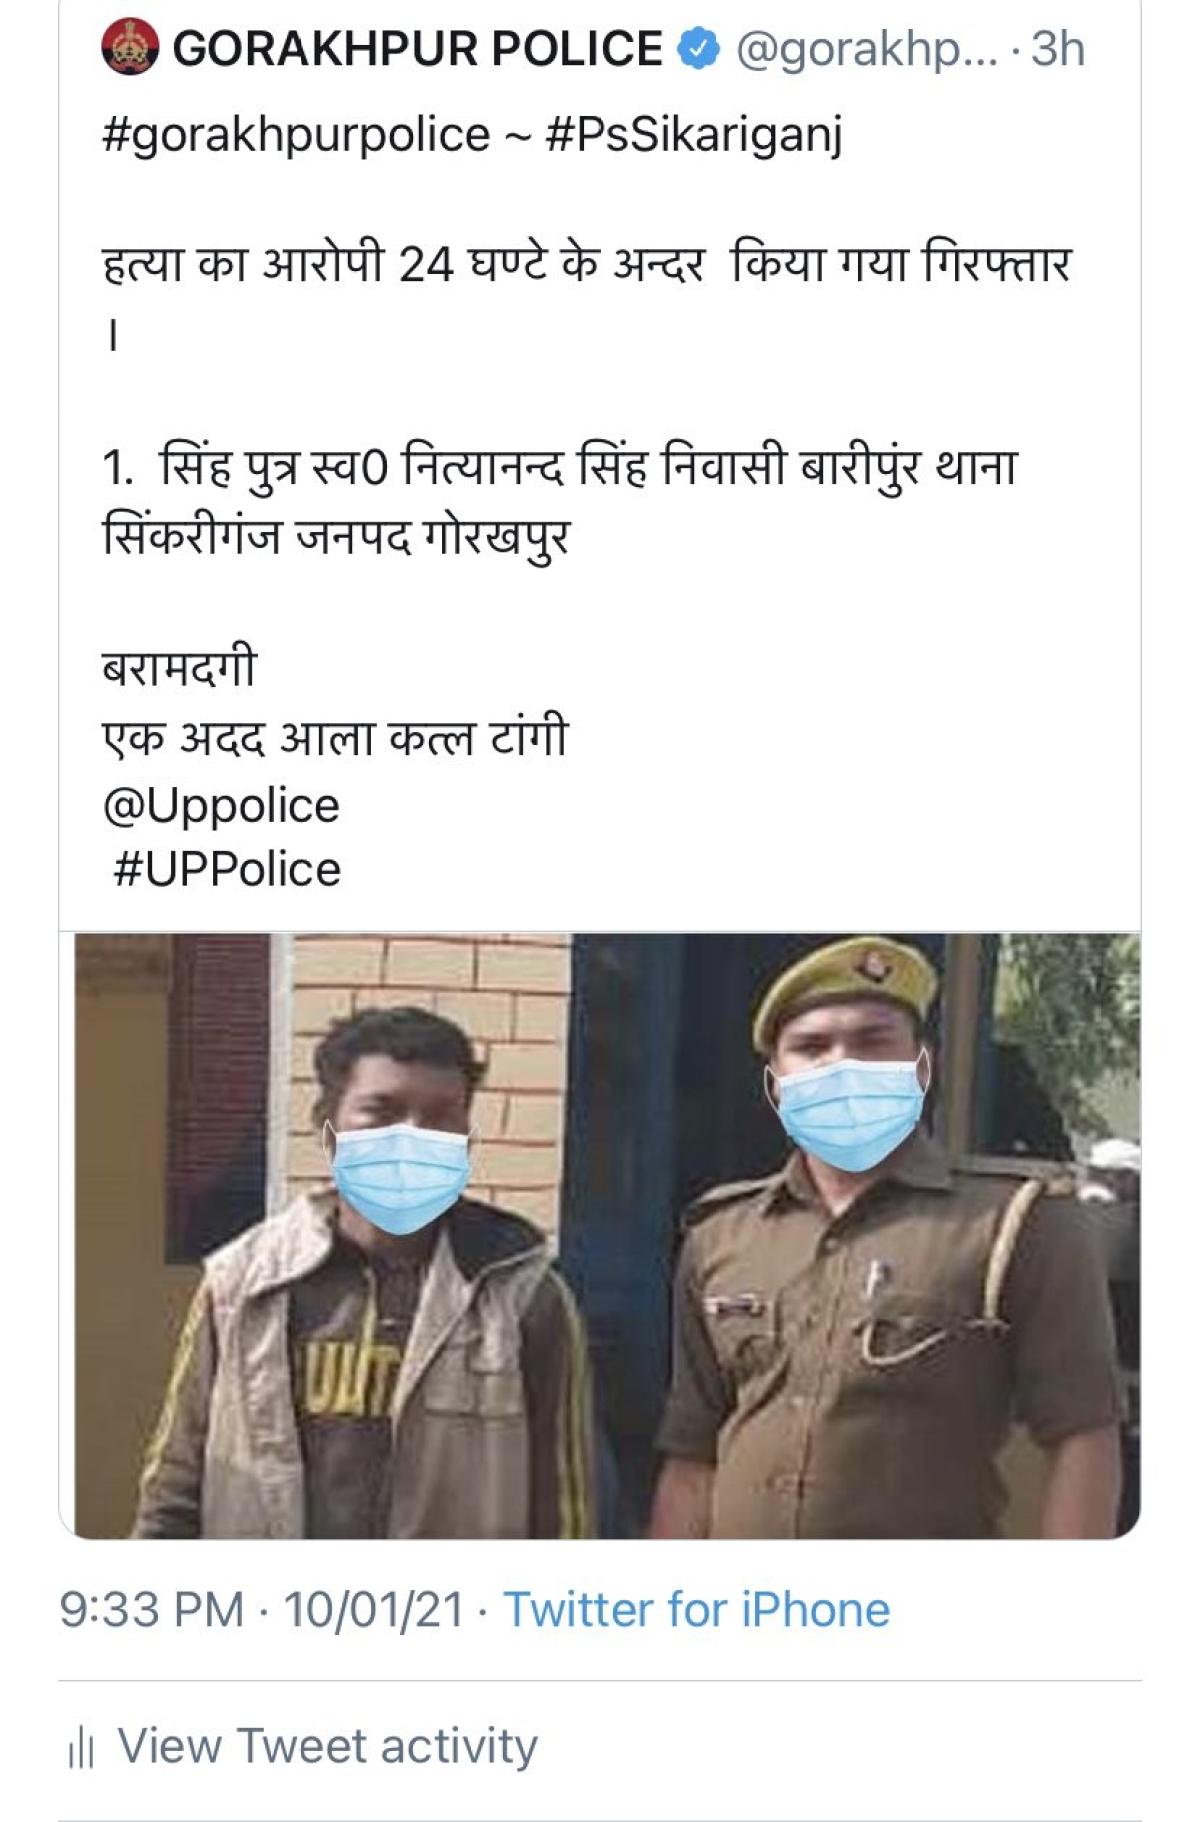 UP Police photoshops mask on cop, arrested criminal; invites meme army's wrath